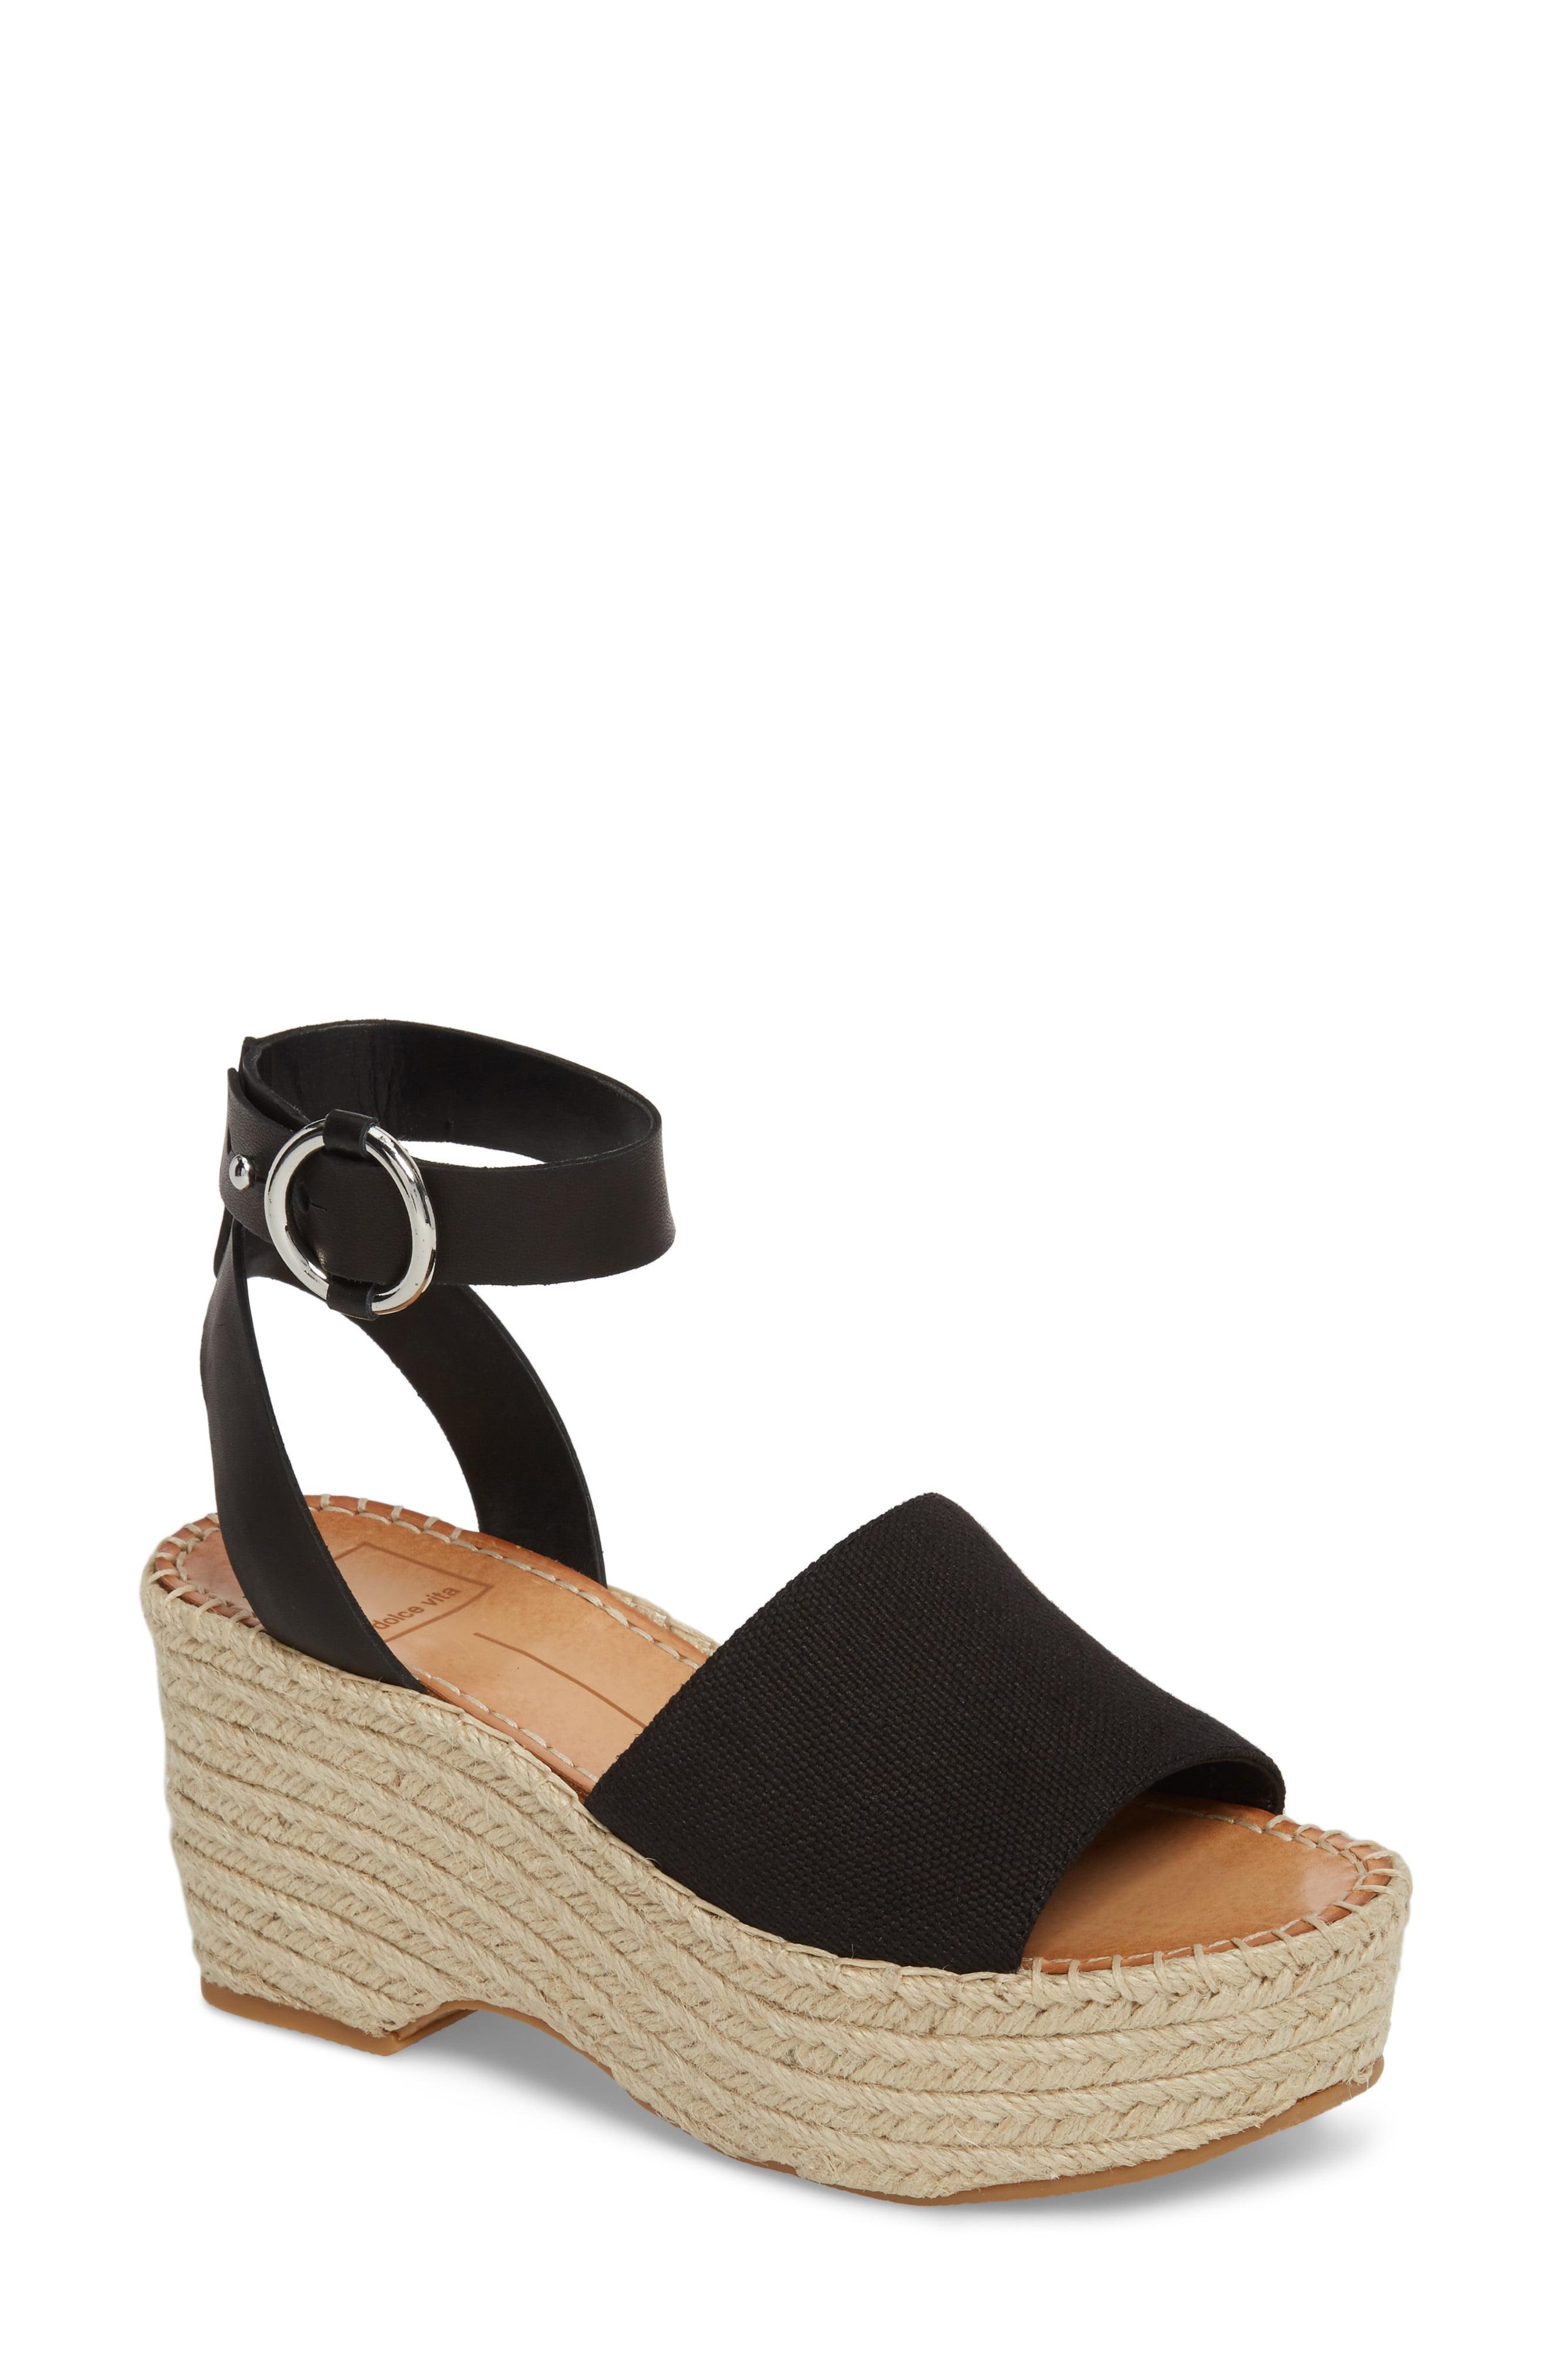 8ff378e5cef Lyst - Dolce Vita Lesly Espadrille Platform Sandal in White